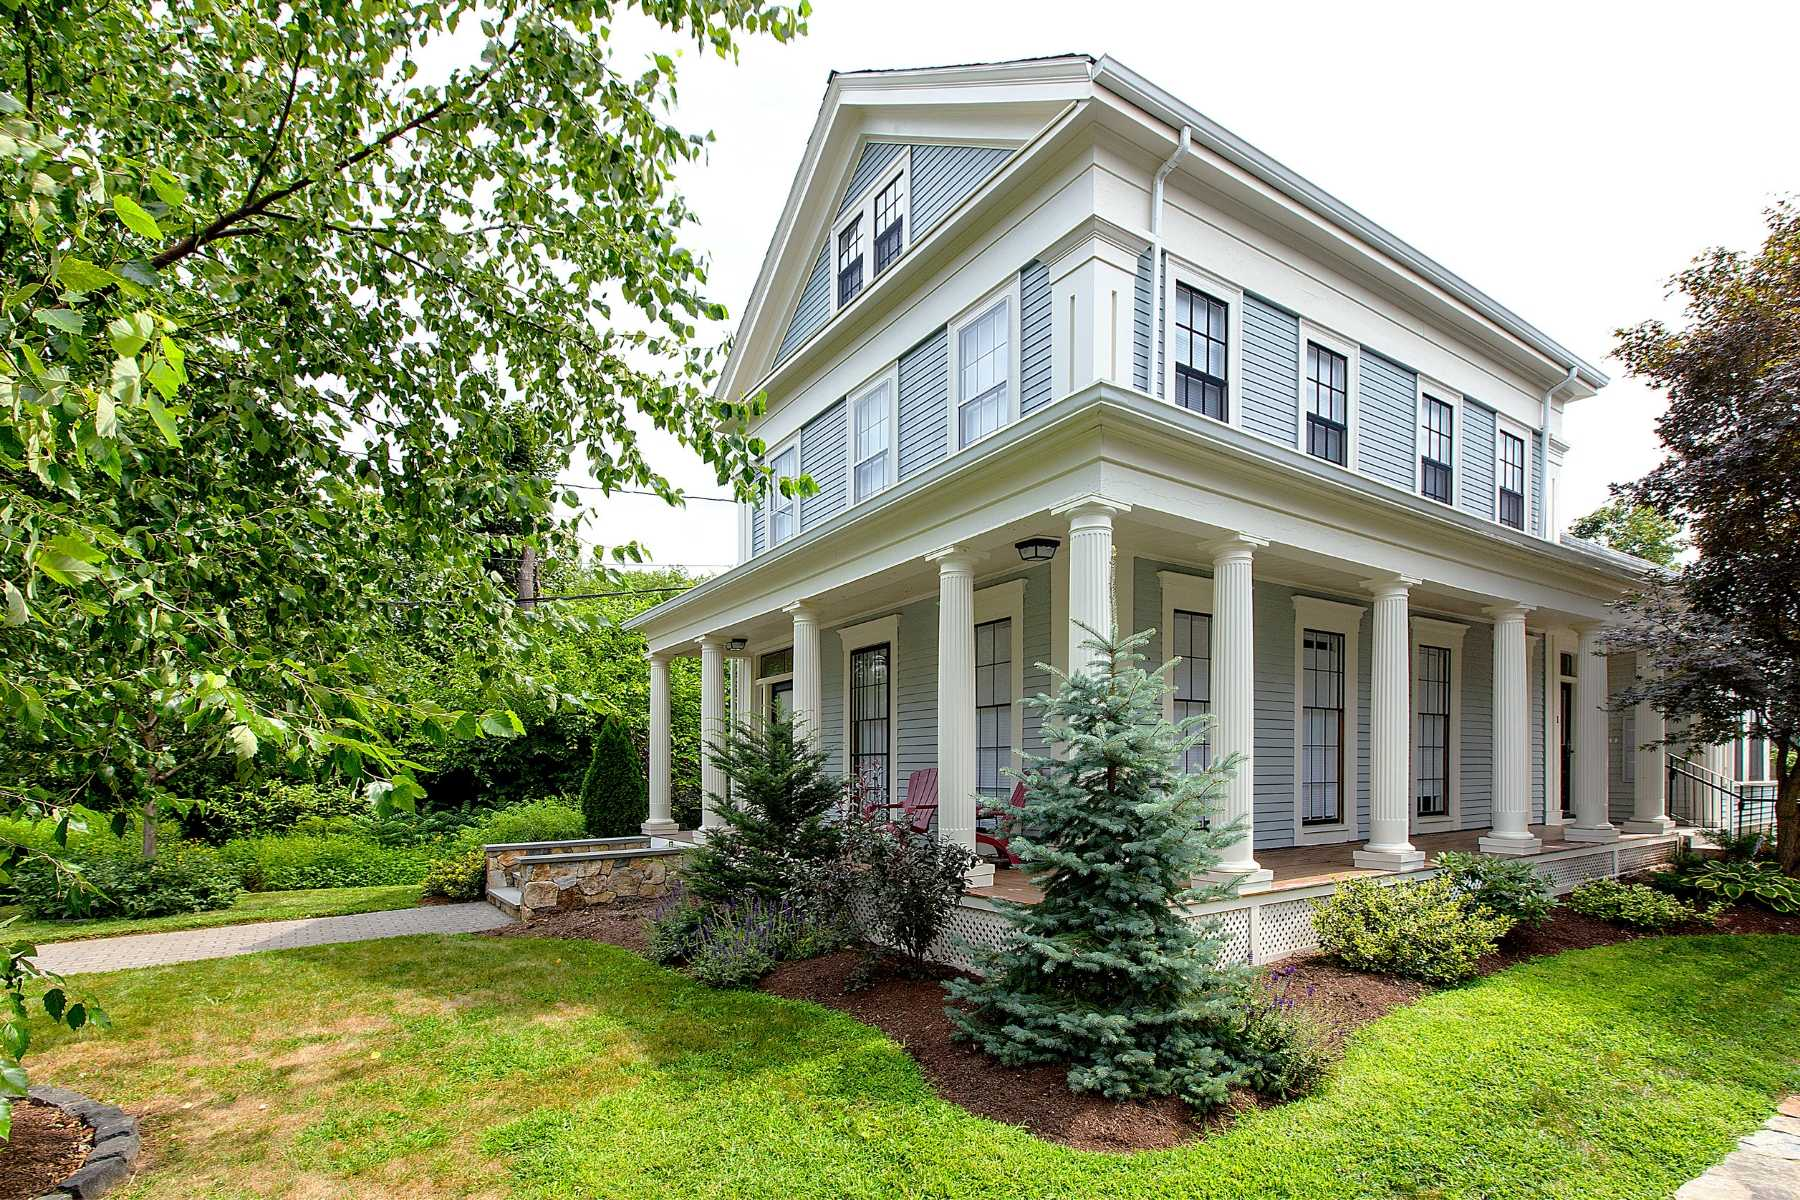 2-CapstoneCommunities-property-13 WinterStreet-Arlington.jpg